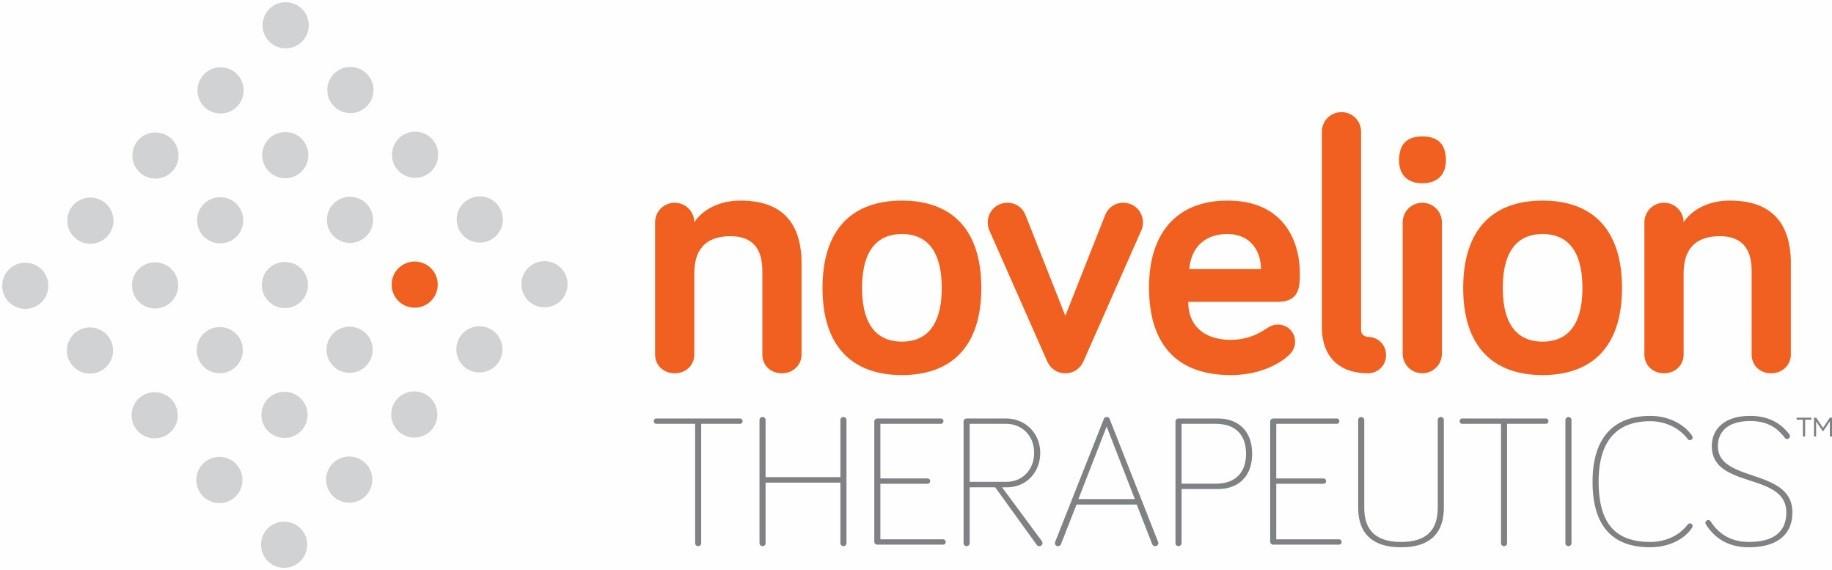 Novelion Therapeutics Confirms Commencement of Voluntary Liquidation